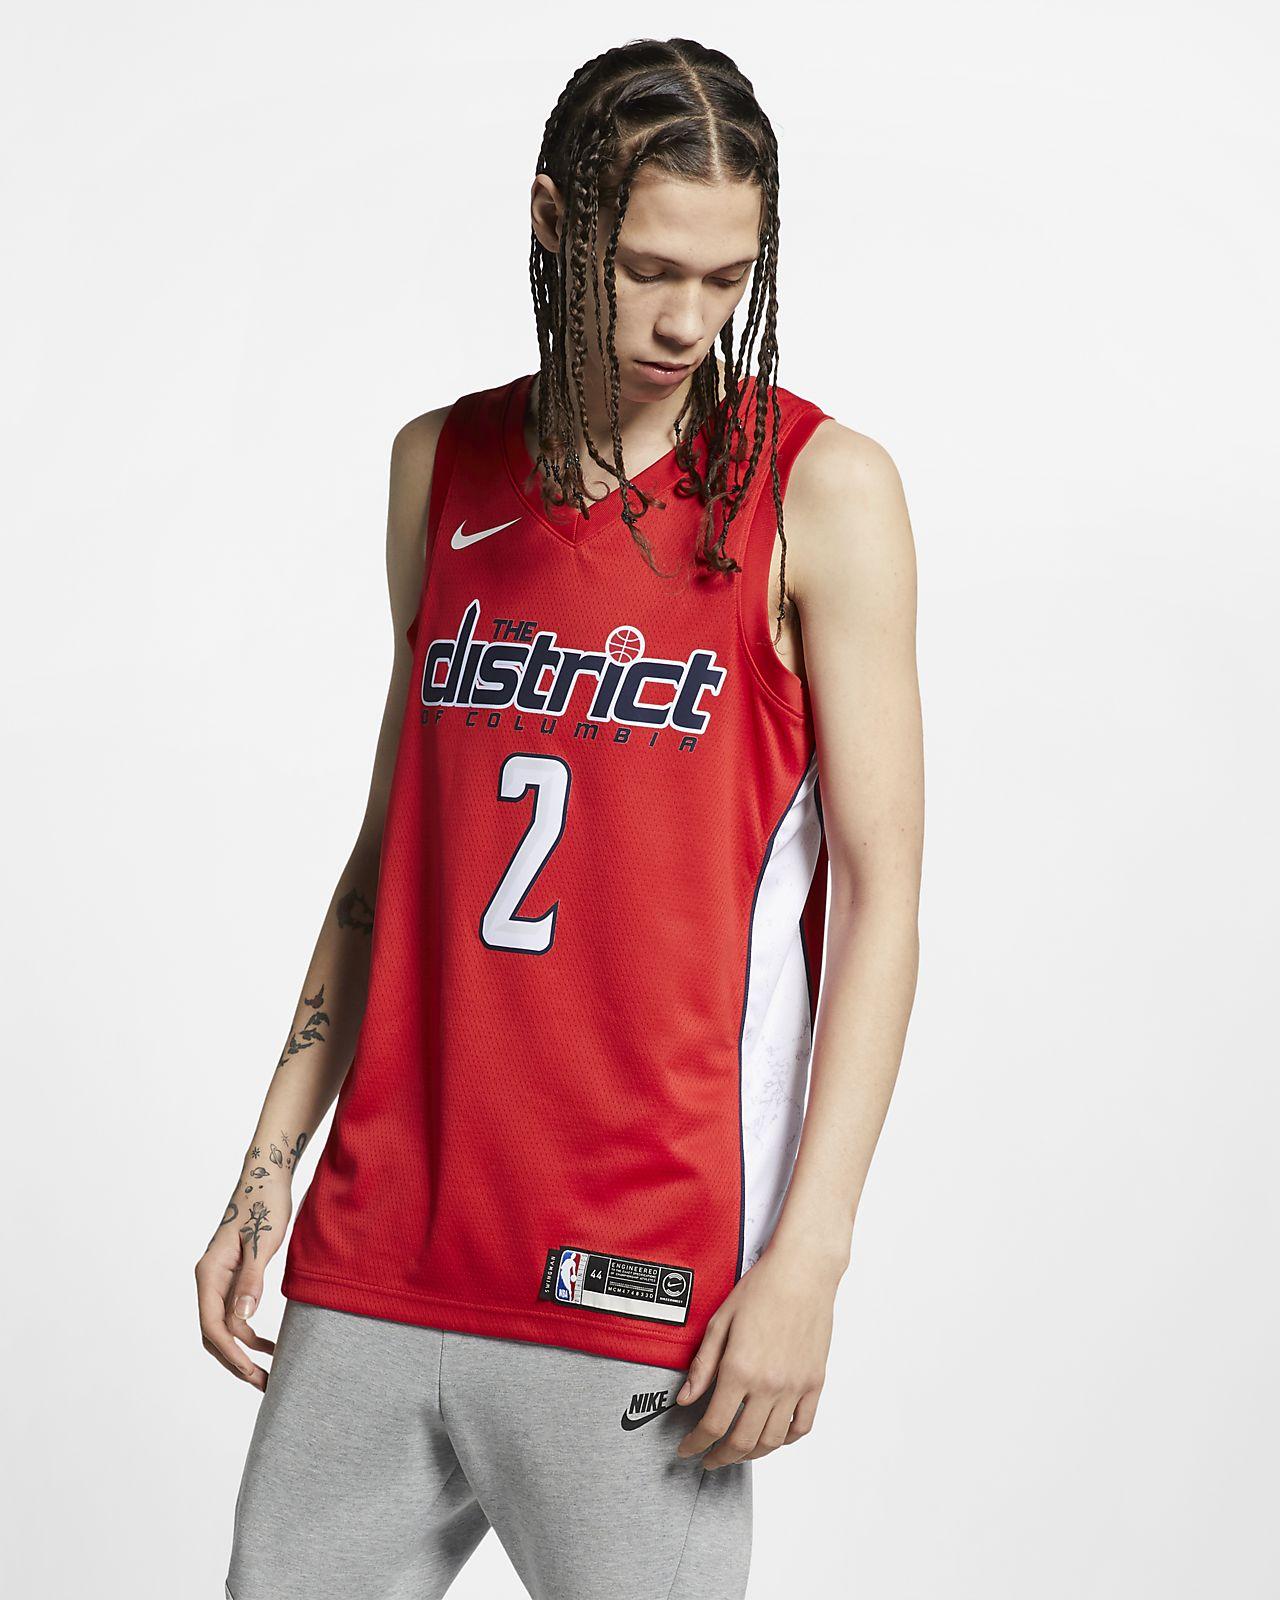 Męska koszulka Nike NBA Connected Jersey John Wall Earned City Edition Swingman (Washington Wizards)